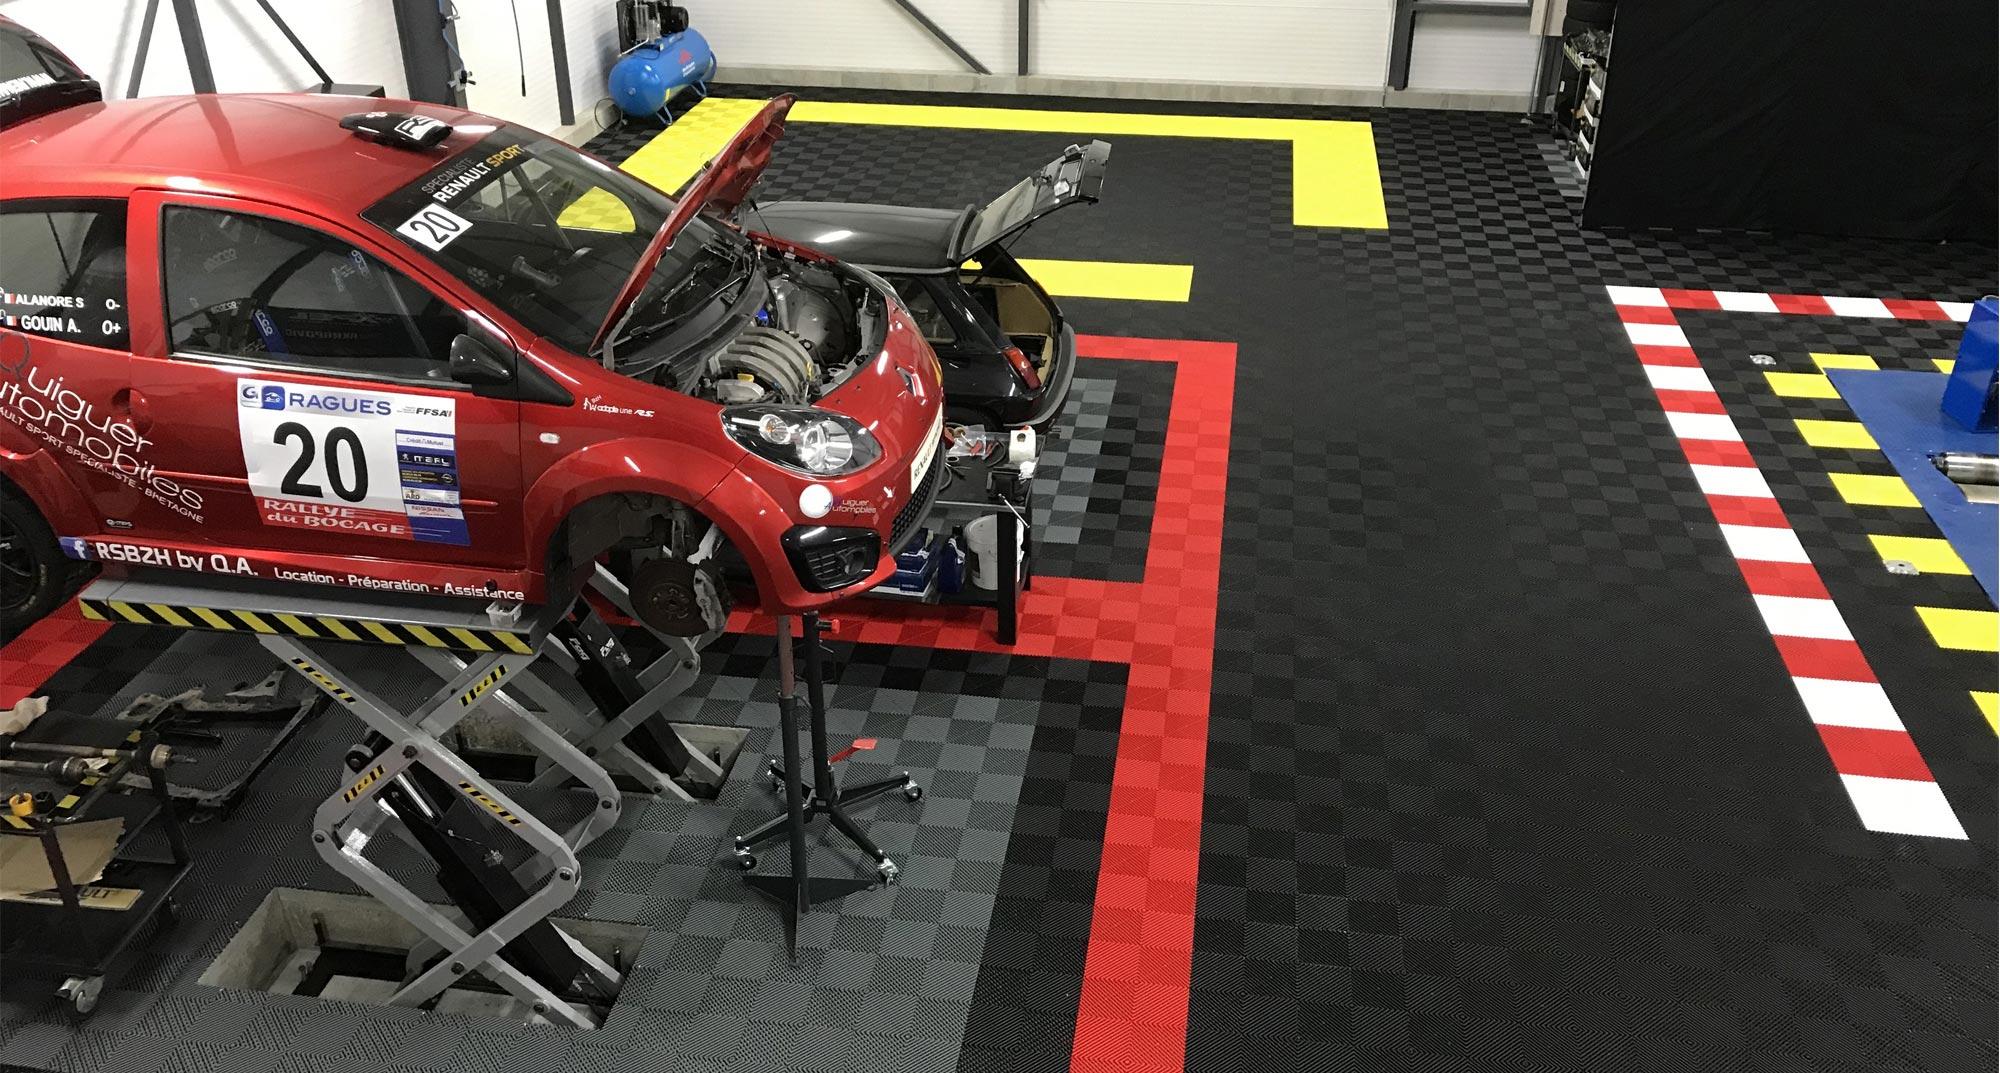 Sol_Polydal_dalles_Atelier_Lorient_Auto_Racing_Precious-Cars